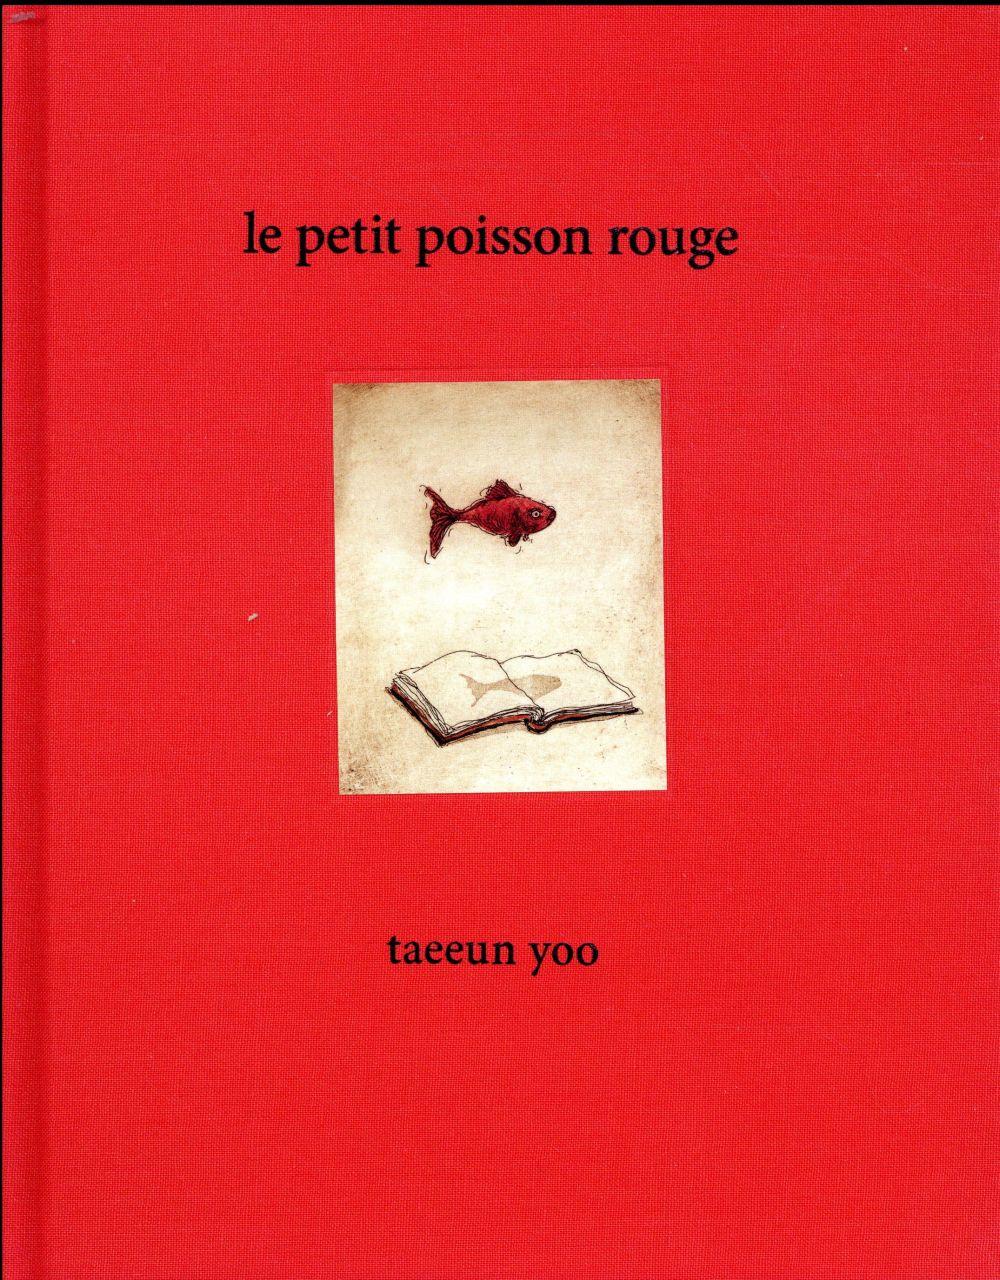 LE PETIT POISSON ROUGE YOO TAEEUN KALEIDOSC